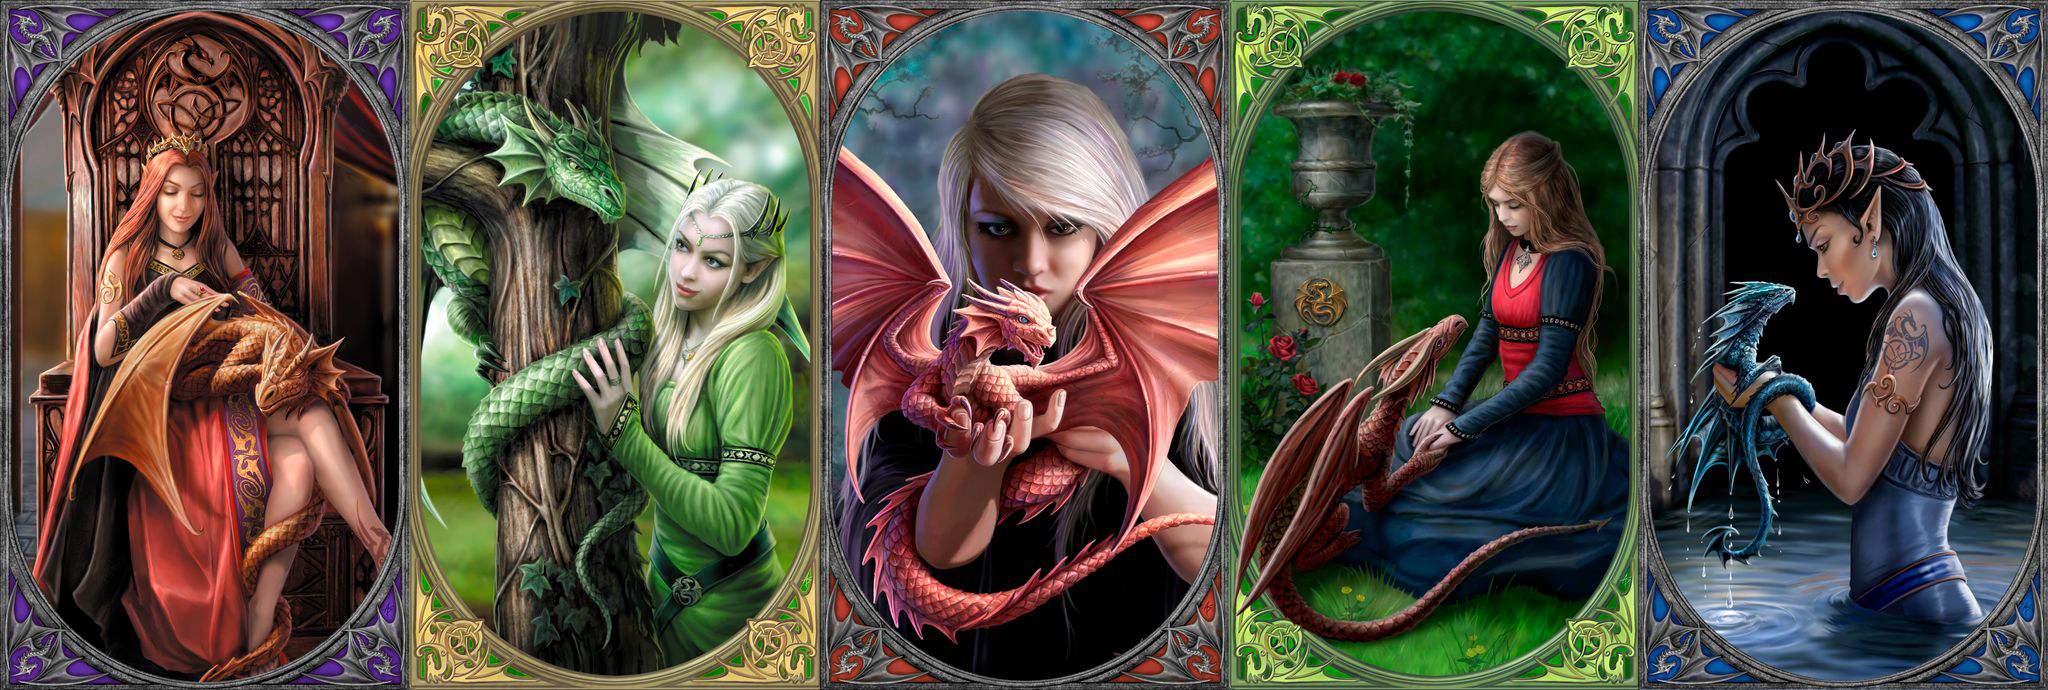 Dragon Friendship Fantasy Jigsaw Puzzle